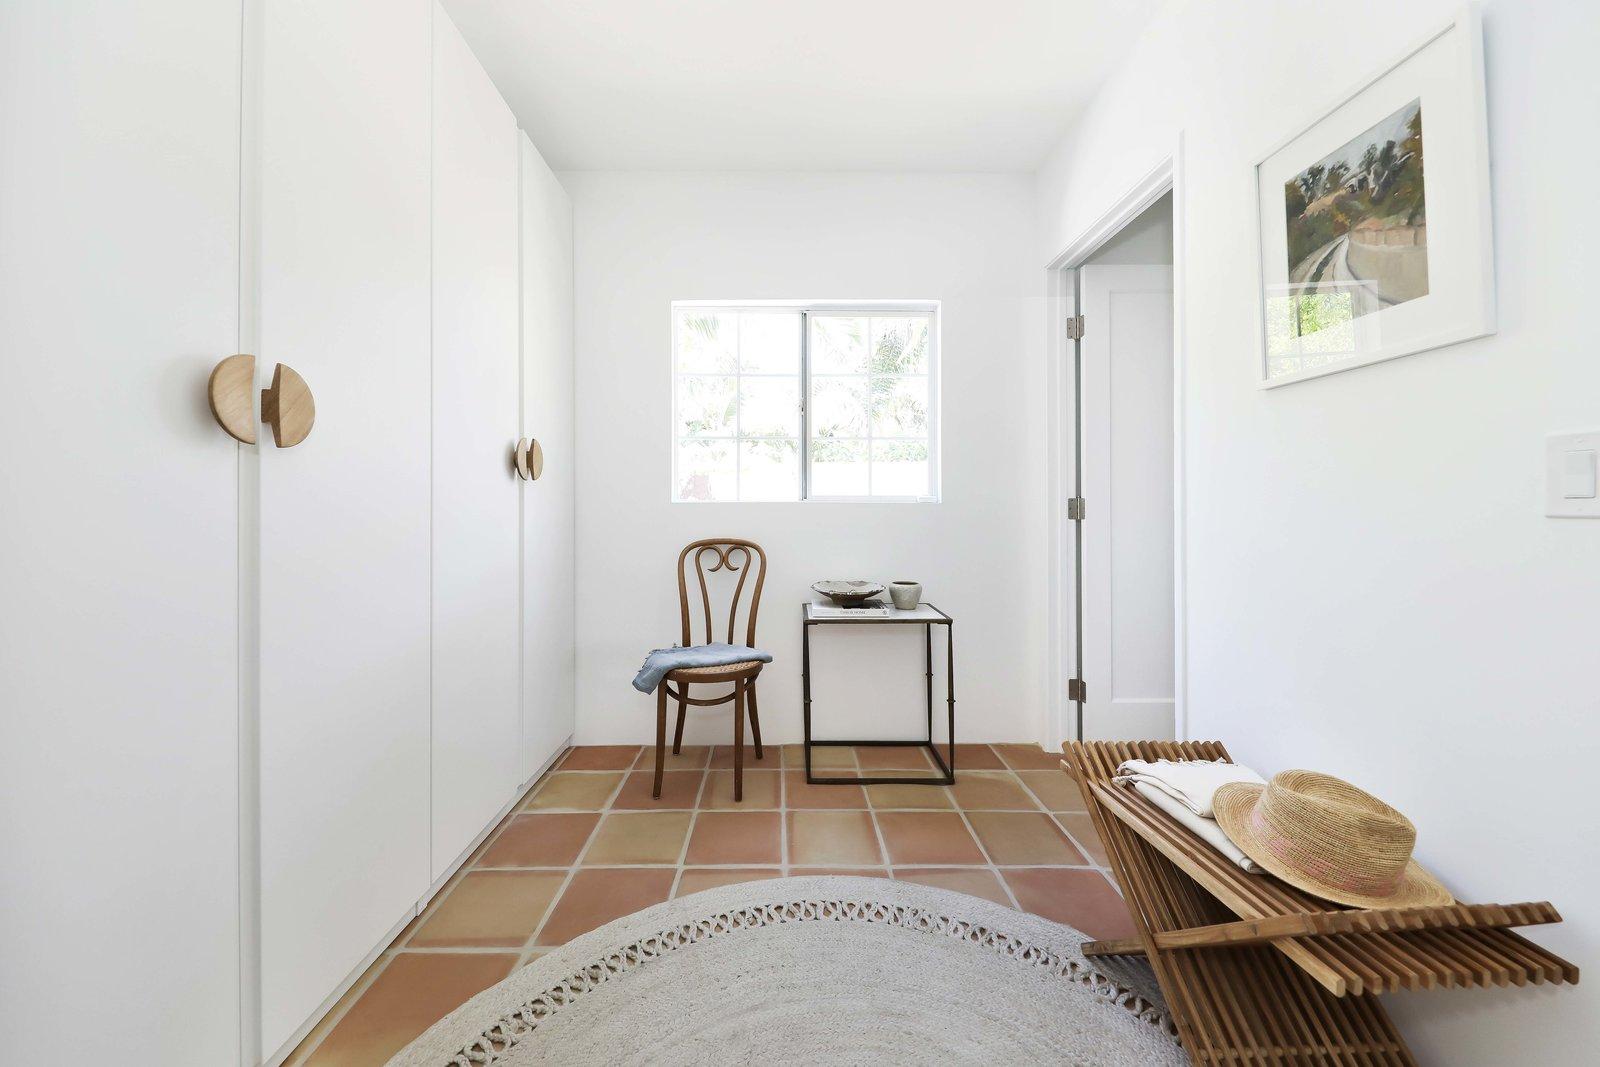 Los Angeles Spanish Bungalow bedroom